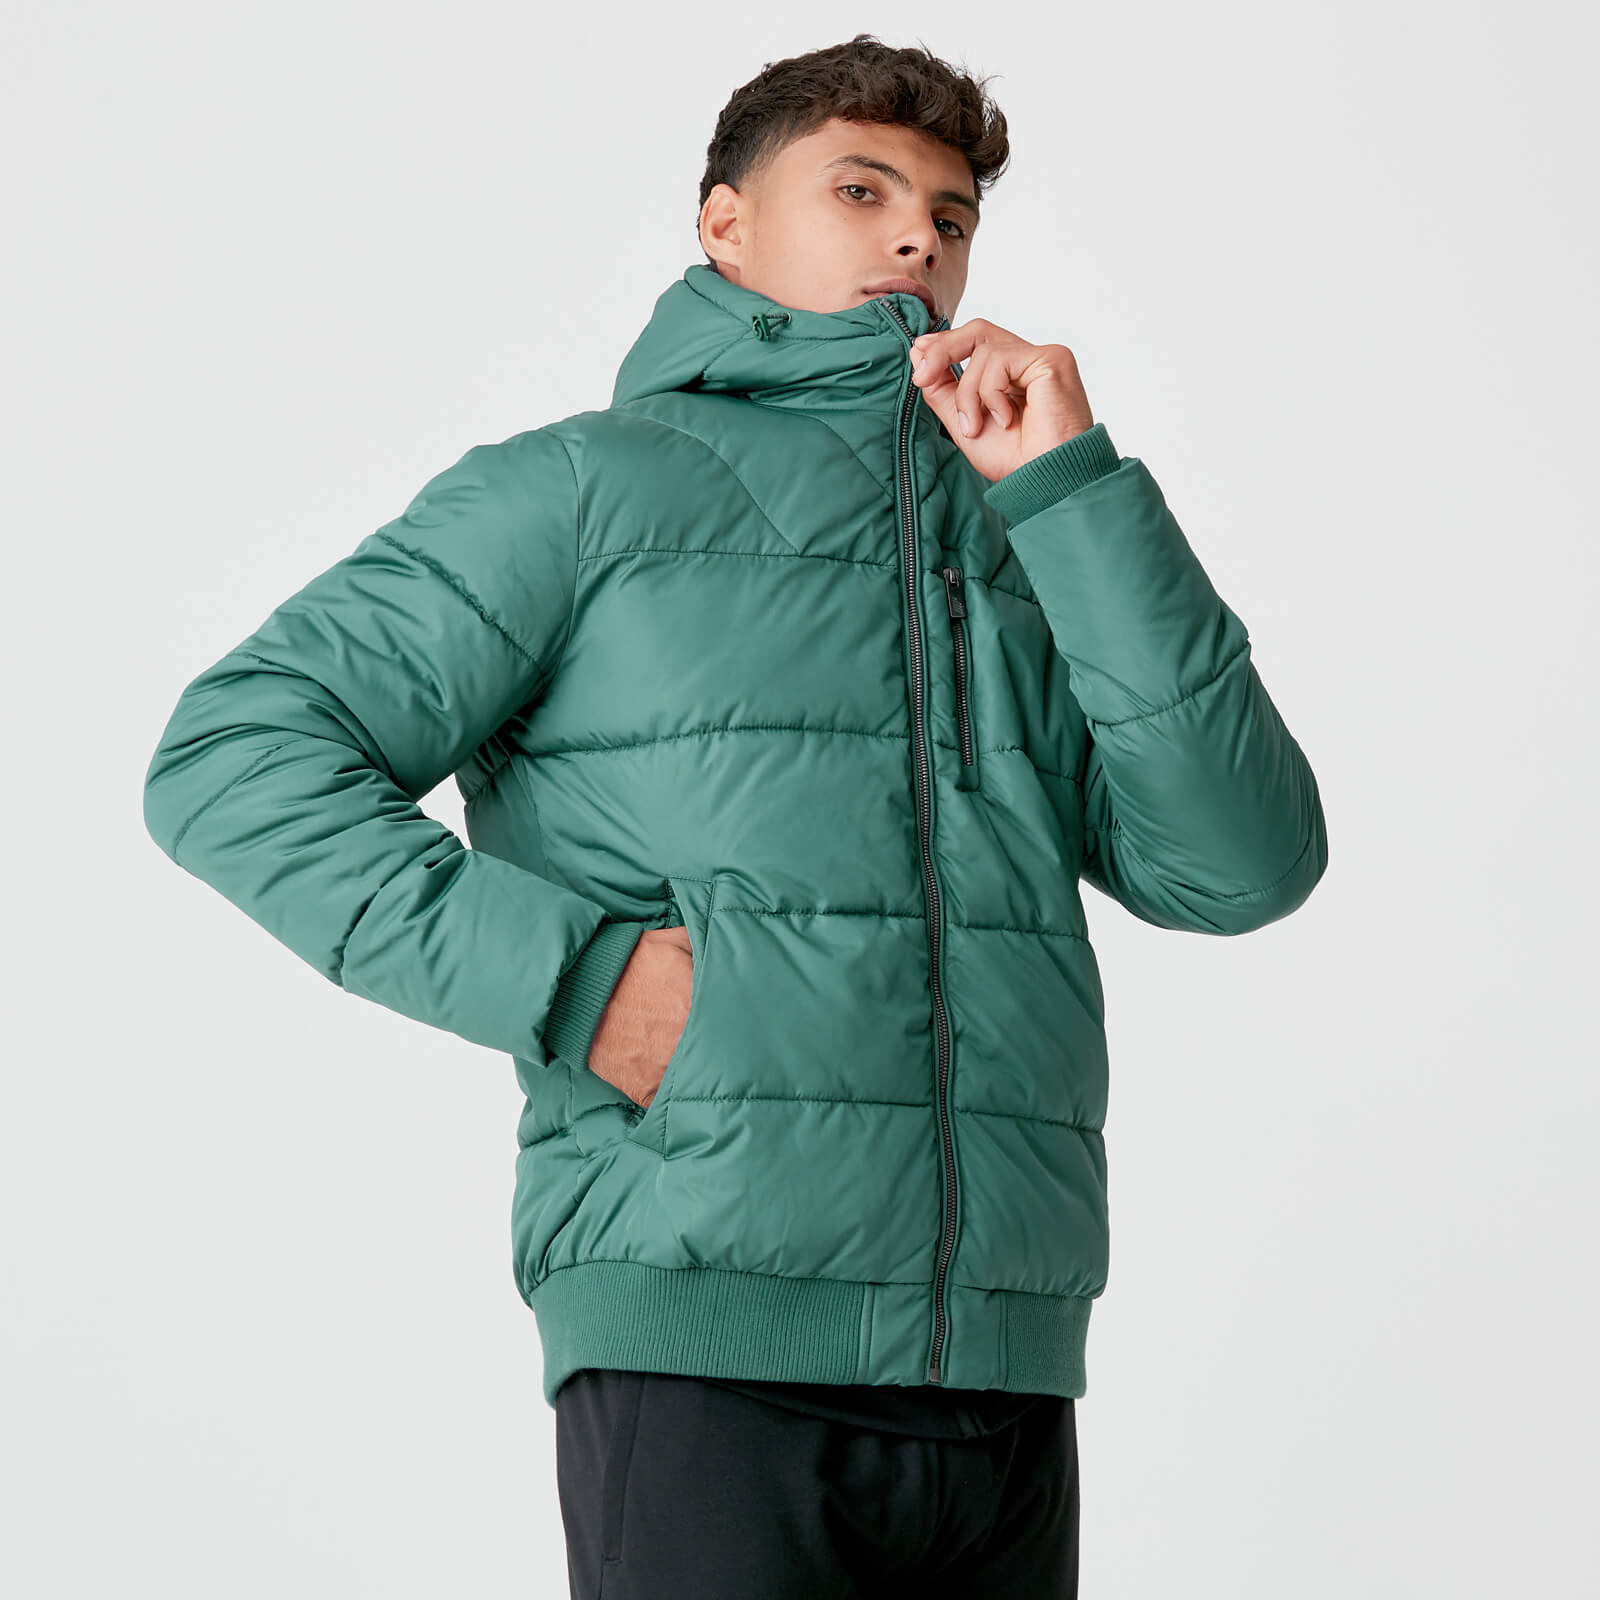 Myprotein Pro-Tech Protect Puffer Jacket - Pine   Hbito.ma